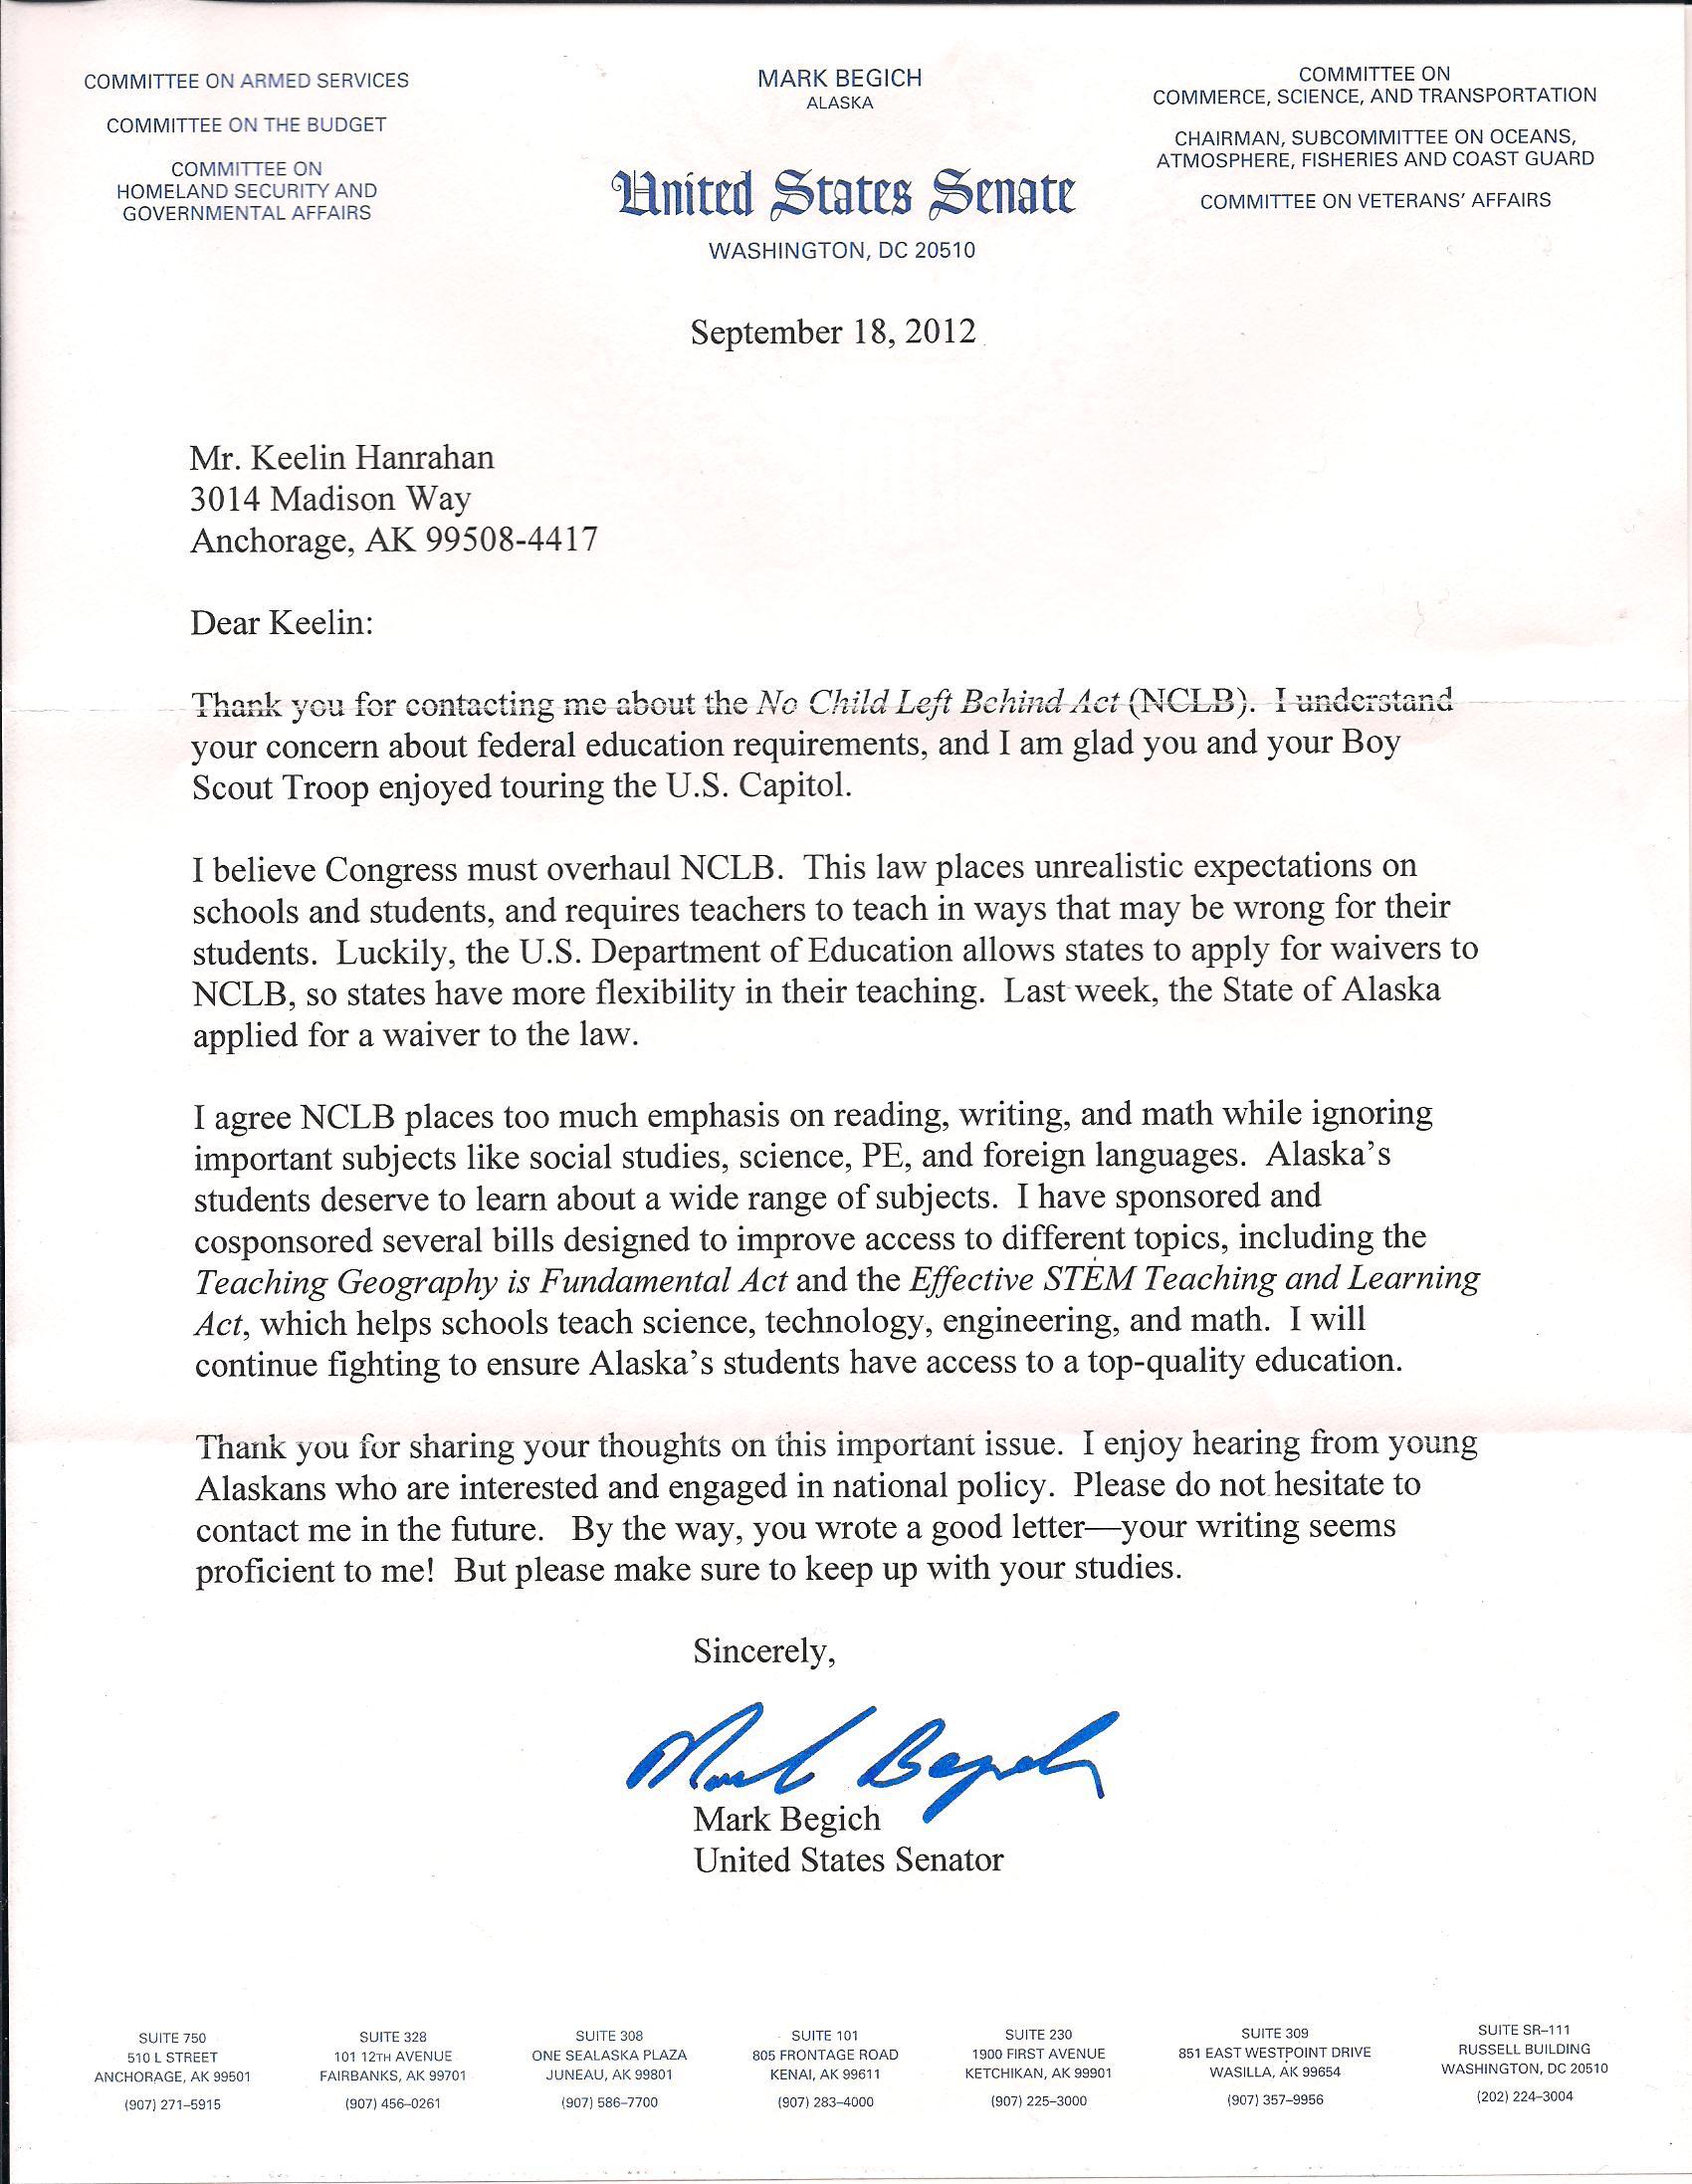 Formal letter to senator sample document resume formal letter to senator sample letter to your senator letters keelin 002 spiritdancerdesigns Gallery